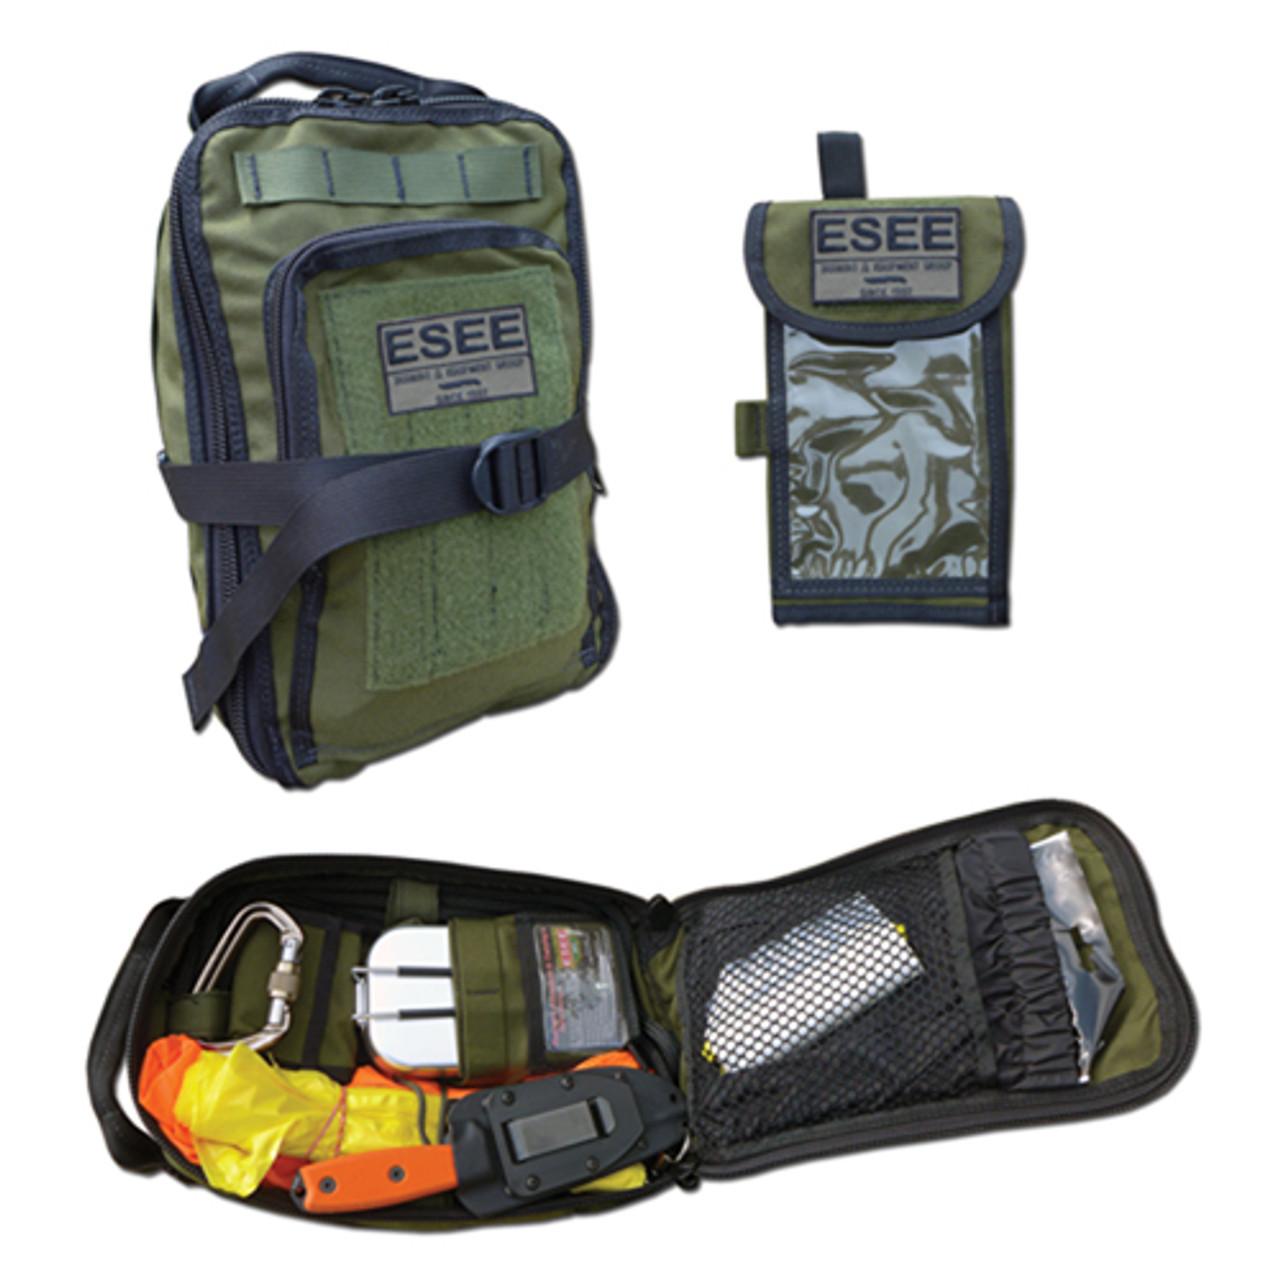 ESEE Advanced Survival Kit, OD Green Cordura Bag, Map Case, w/ ESEE 4P Black Blade, Orange G10 Handle